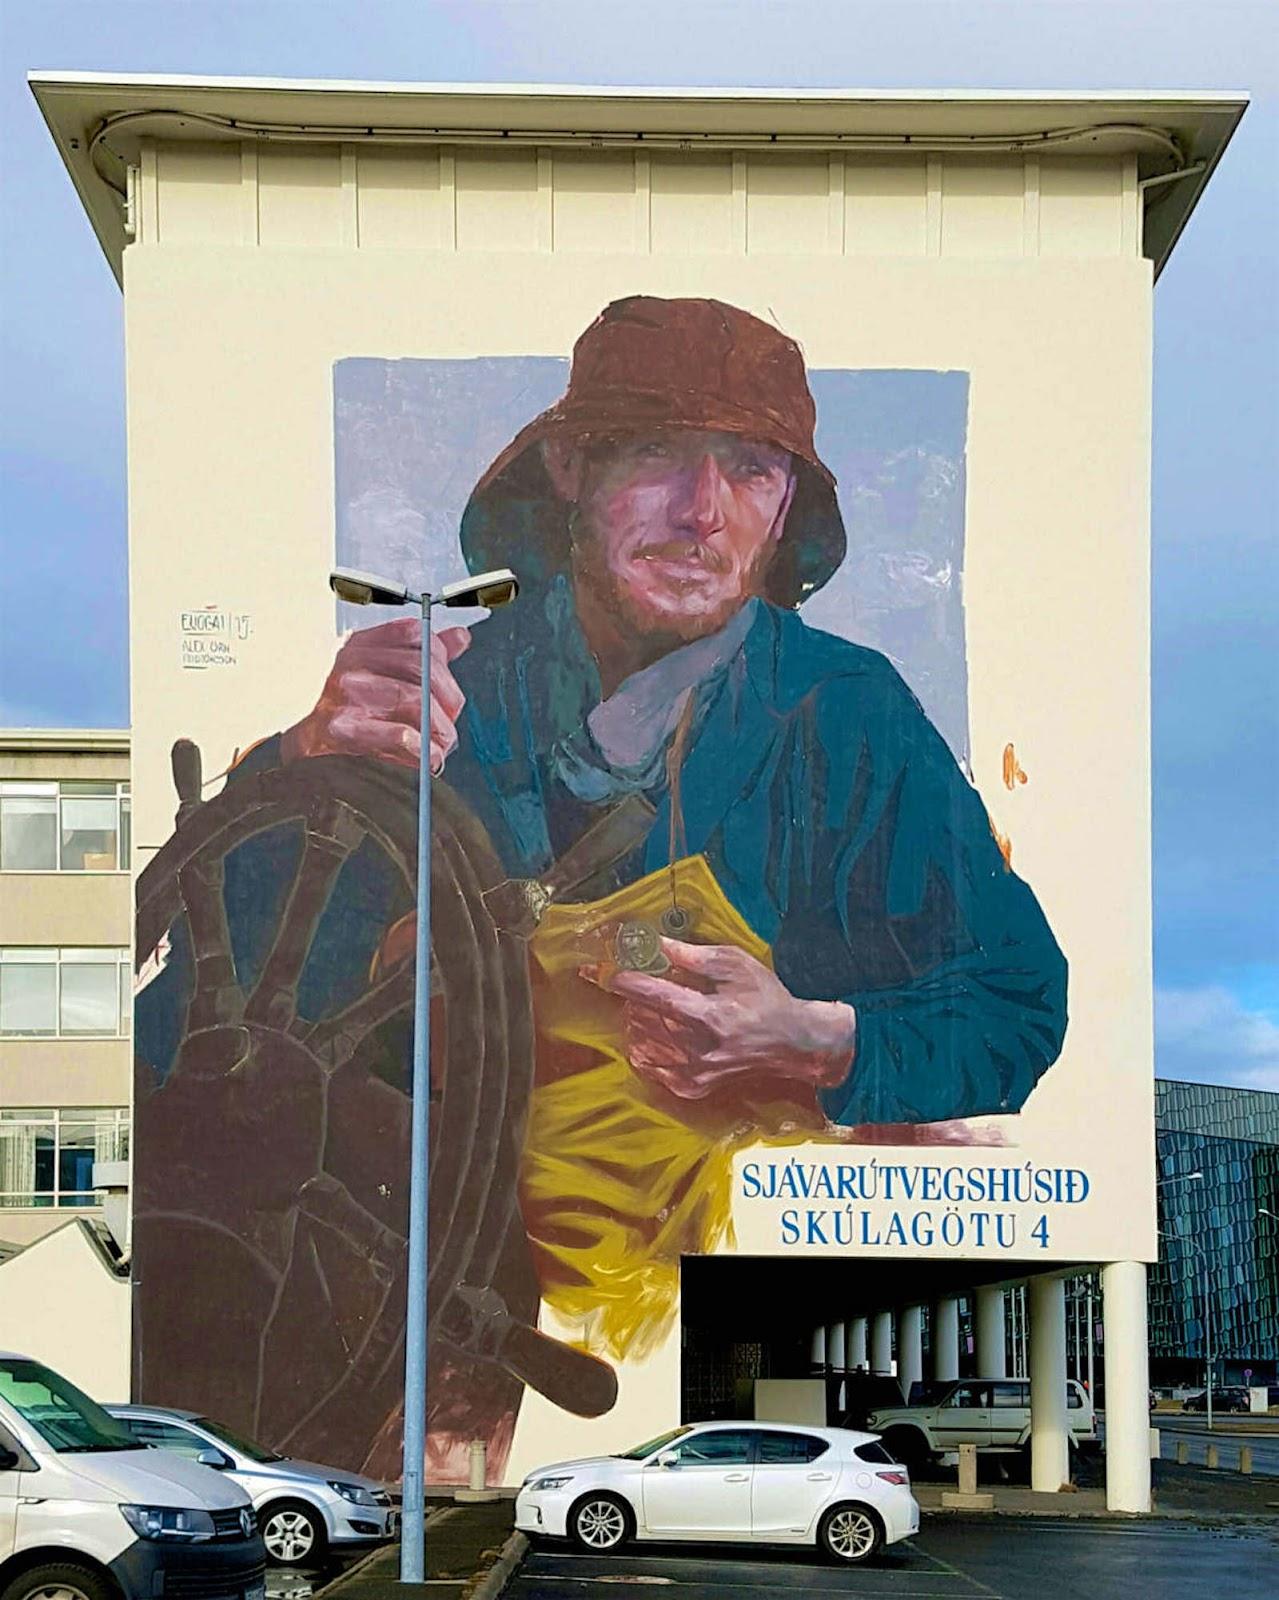 ufunk-reykjavik-street-art-2.jpg